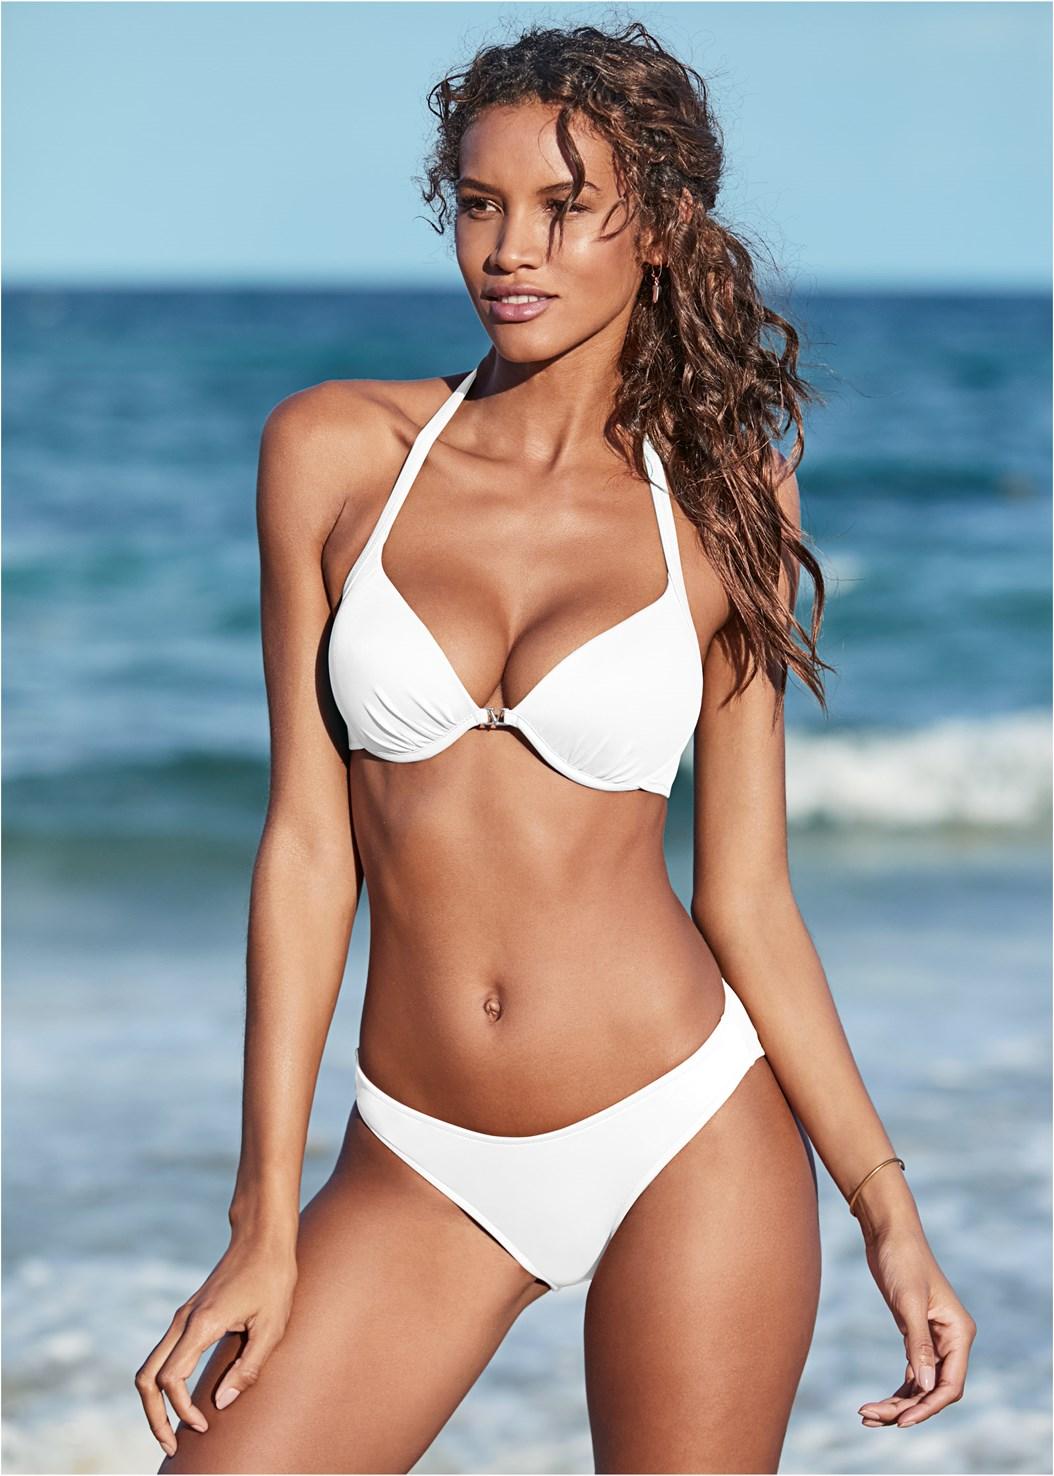 Venus Enhancer Halter Top,Scoop Front Classic Bikini Bottom ,Low Rise Classic Bikini Bottom ,String Side Bikini Bottom,Sheer Caftan Cover-Up